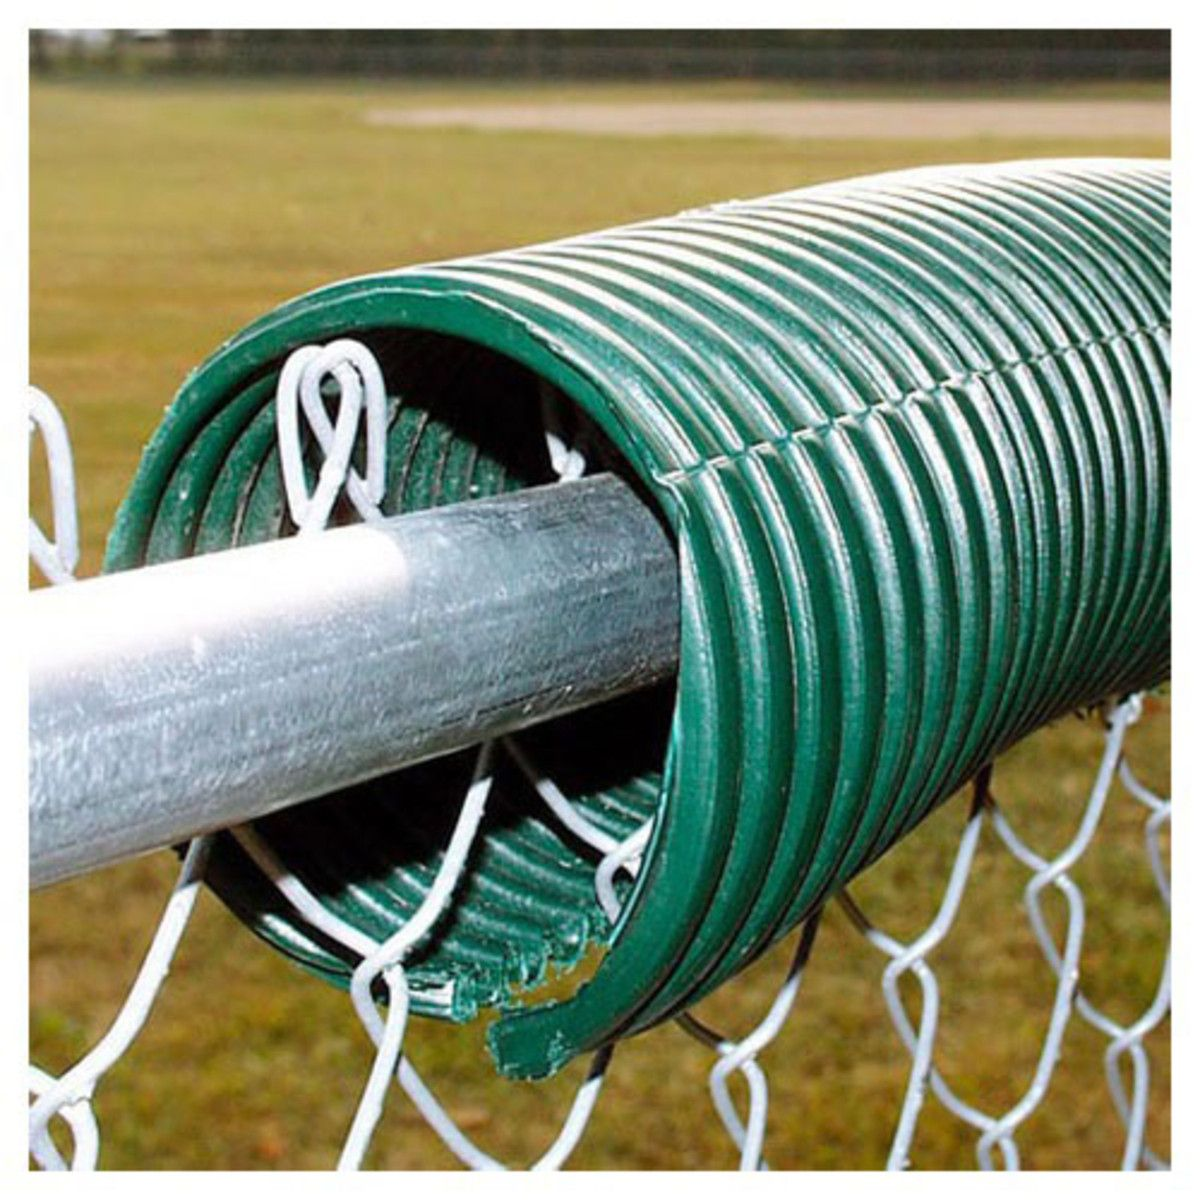 Poly Cap Fence Guard | Fencing | Cat | Pinterest | Fences